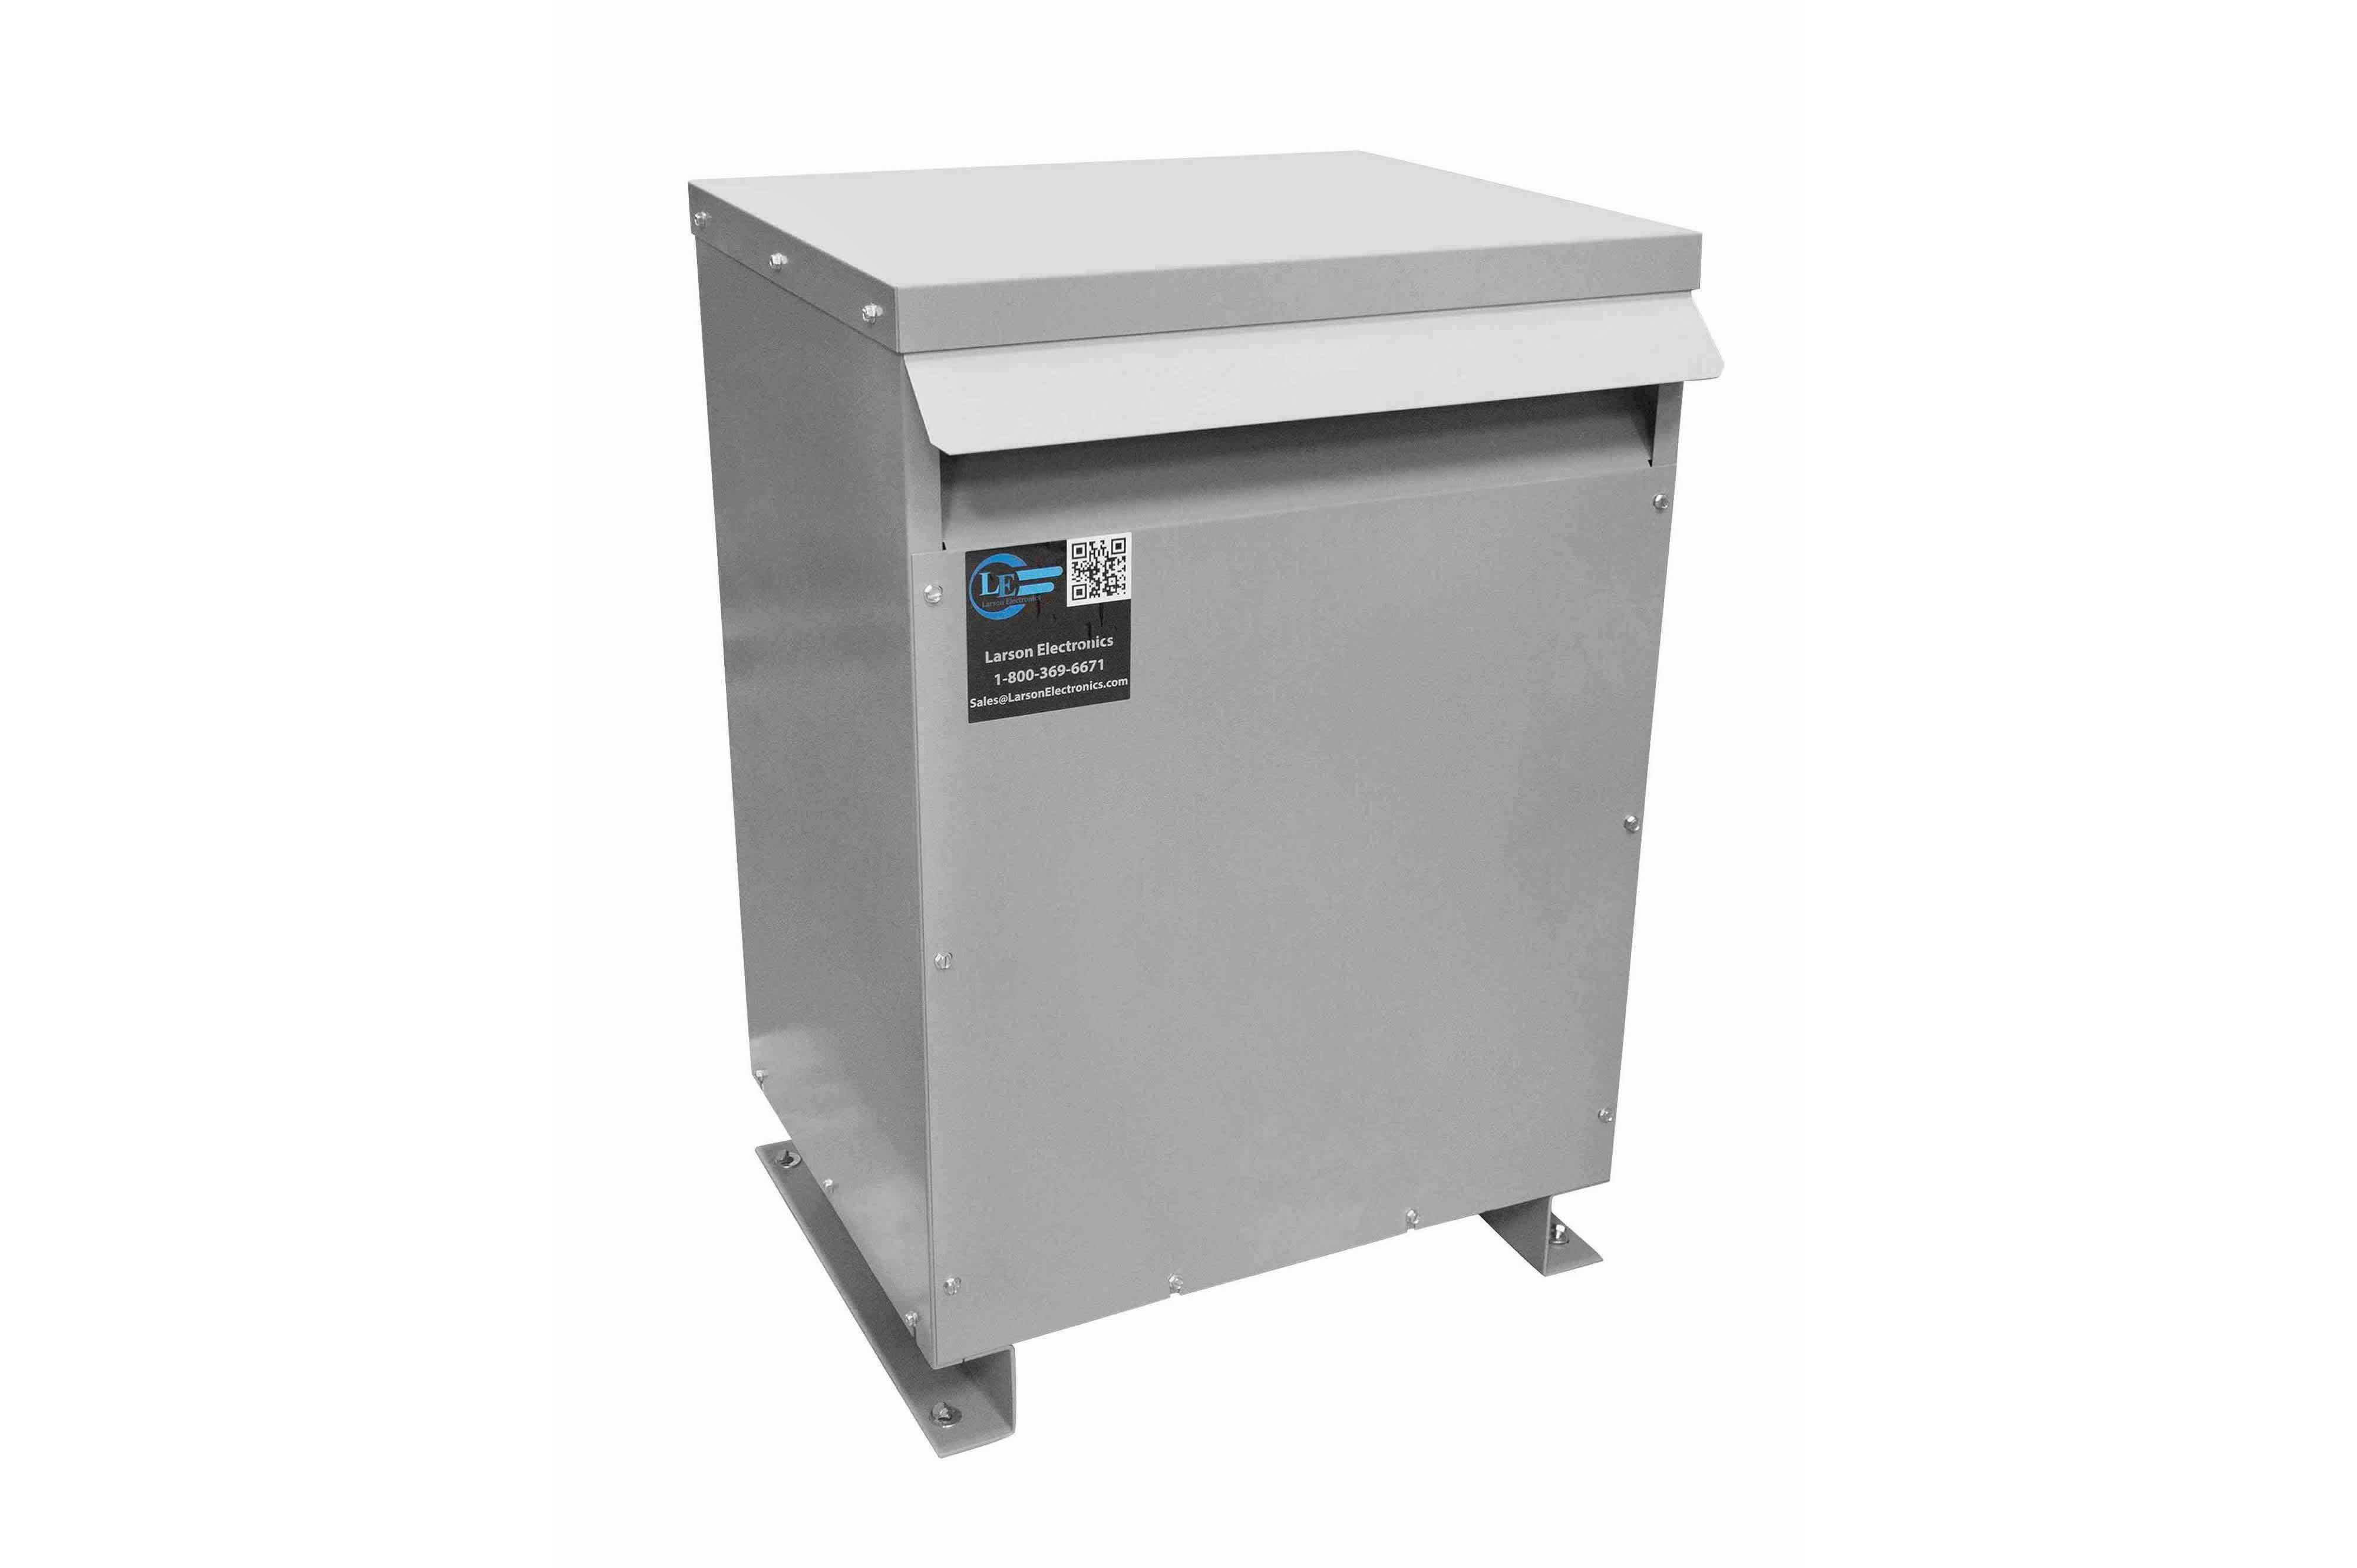 45 kVA 3PH Isolation Transformer, 208V Wye Primary, 415V Delta Secondary, N3R, Ventilated, 60 Hz